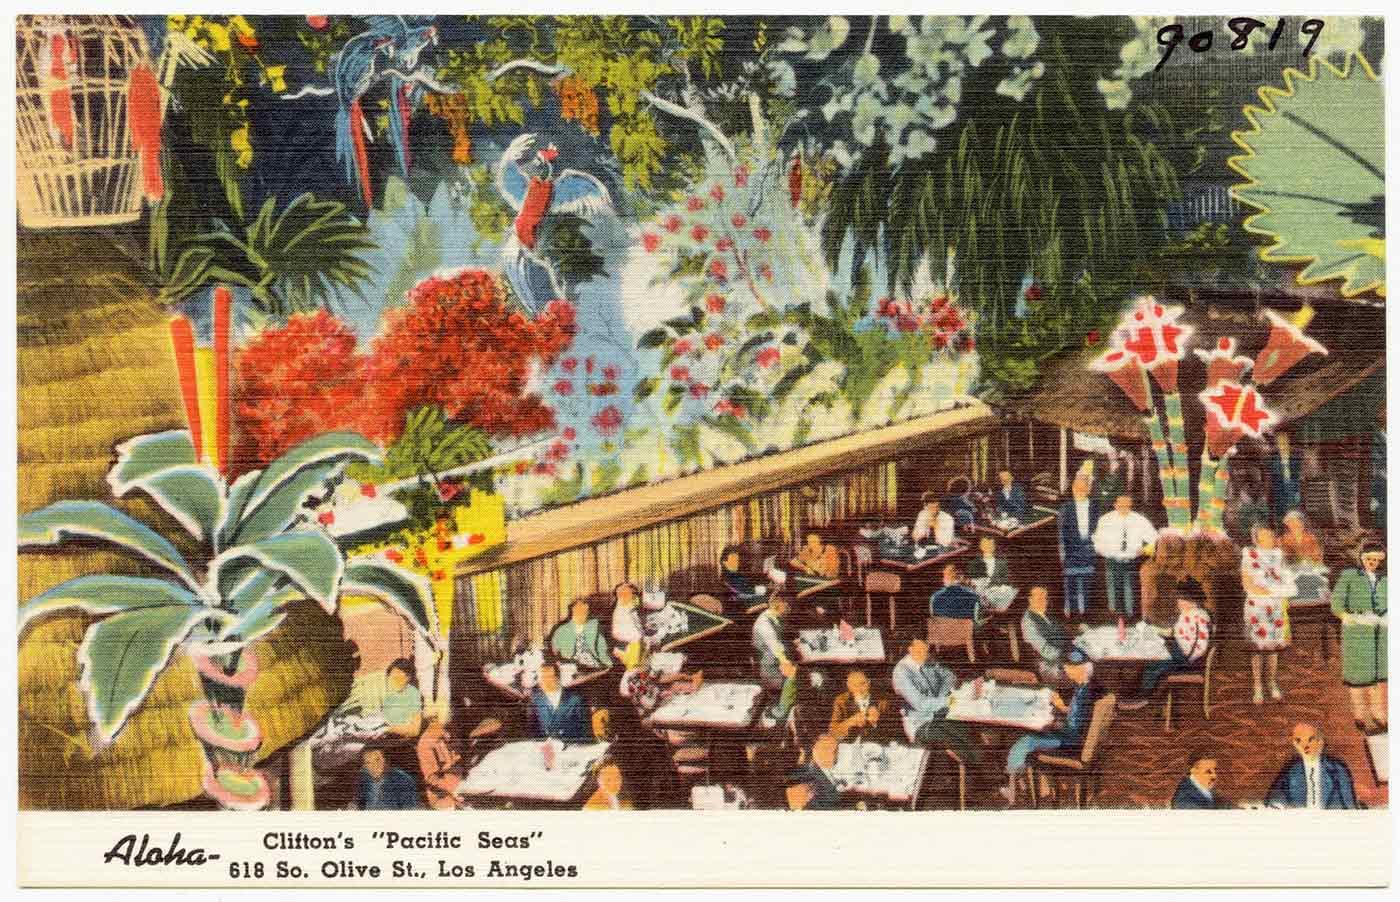 "Aloha- Clifton's ""Pacific Seas,"" 618 So. Olive St., Los Angeles."